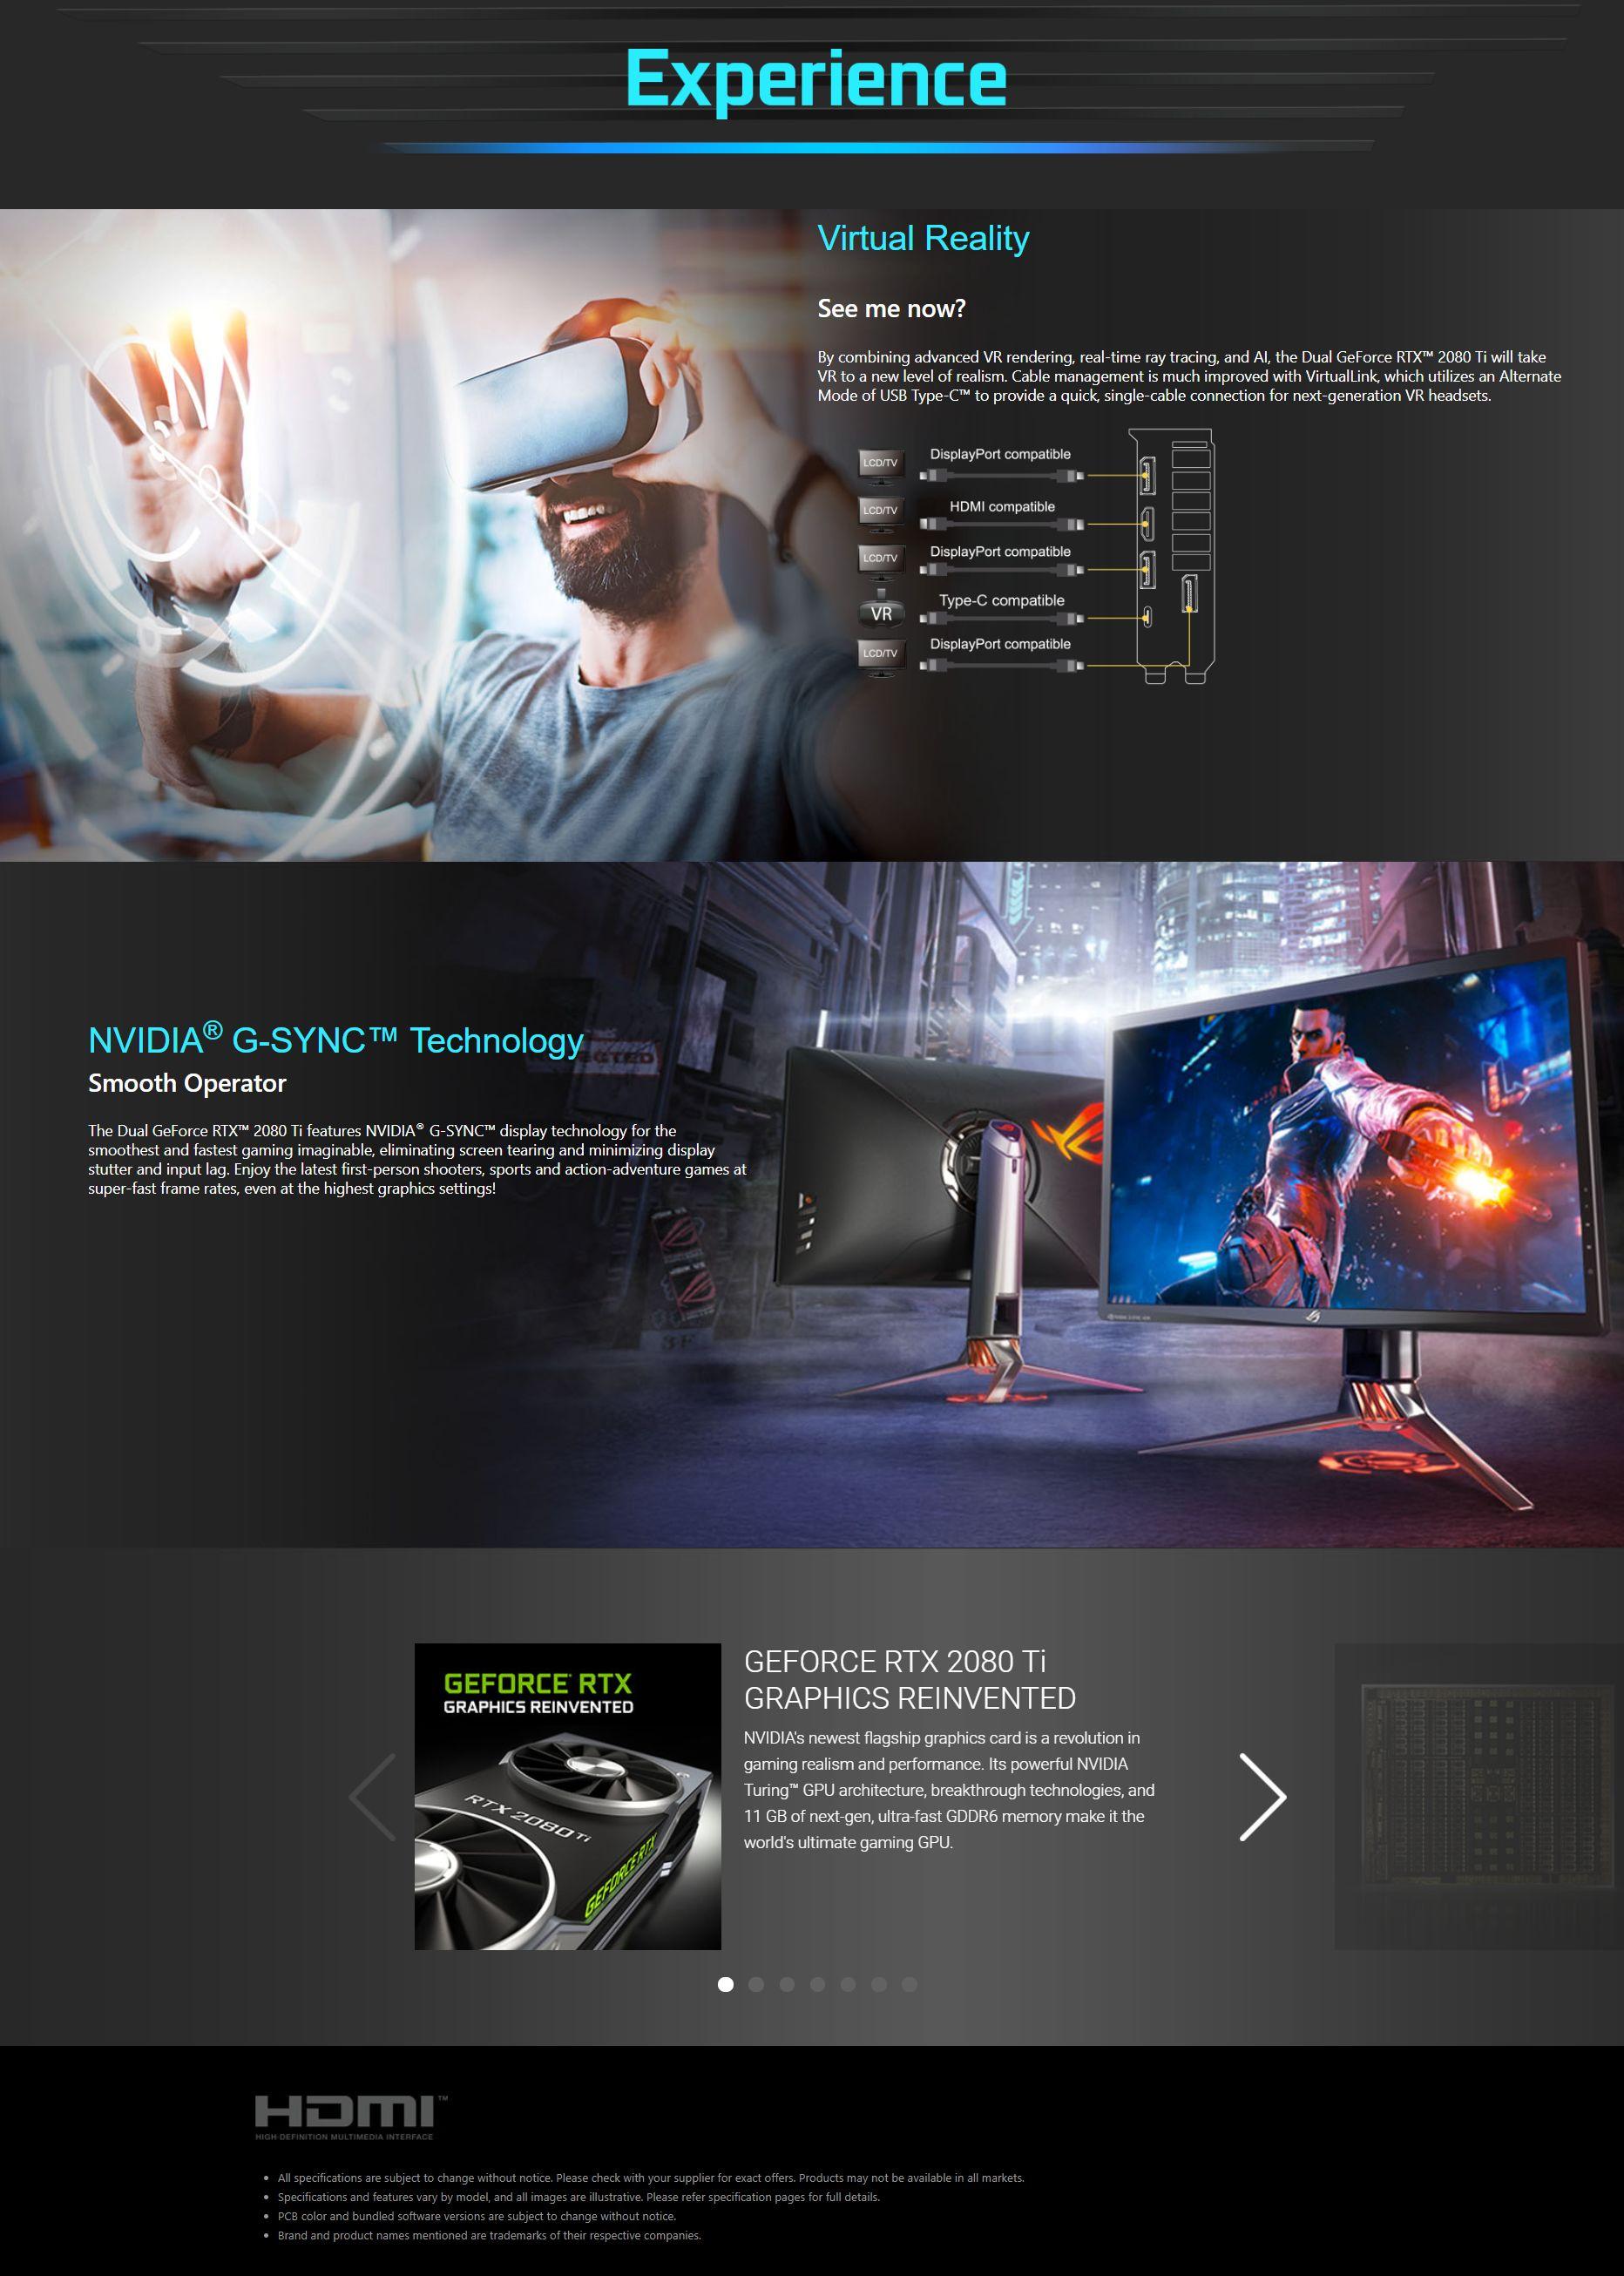 Asus GeForce RTX 2080 Ti Dual 11G OC Graphics Card